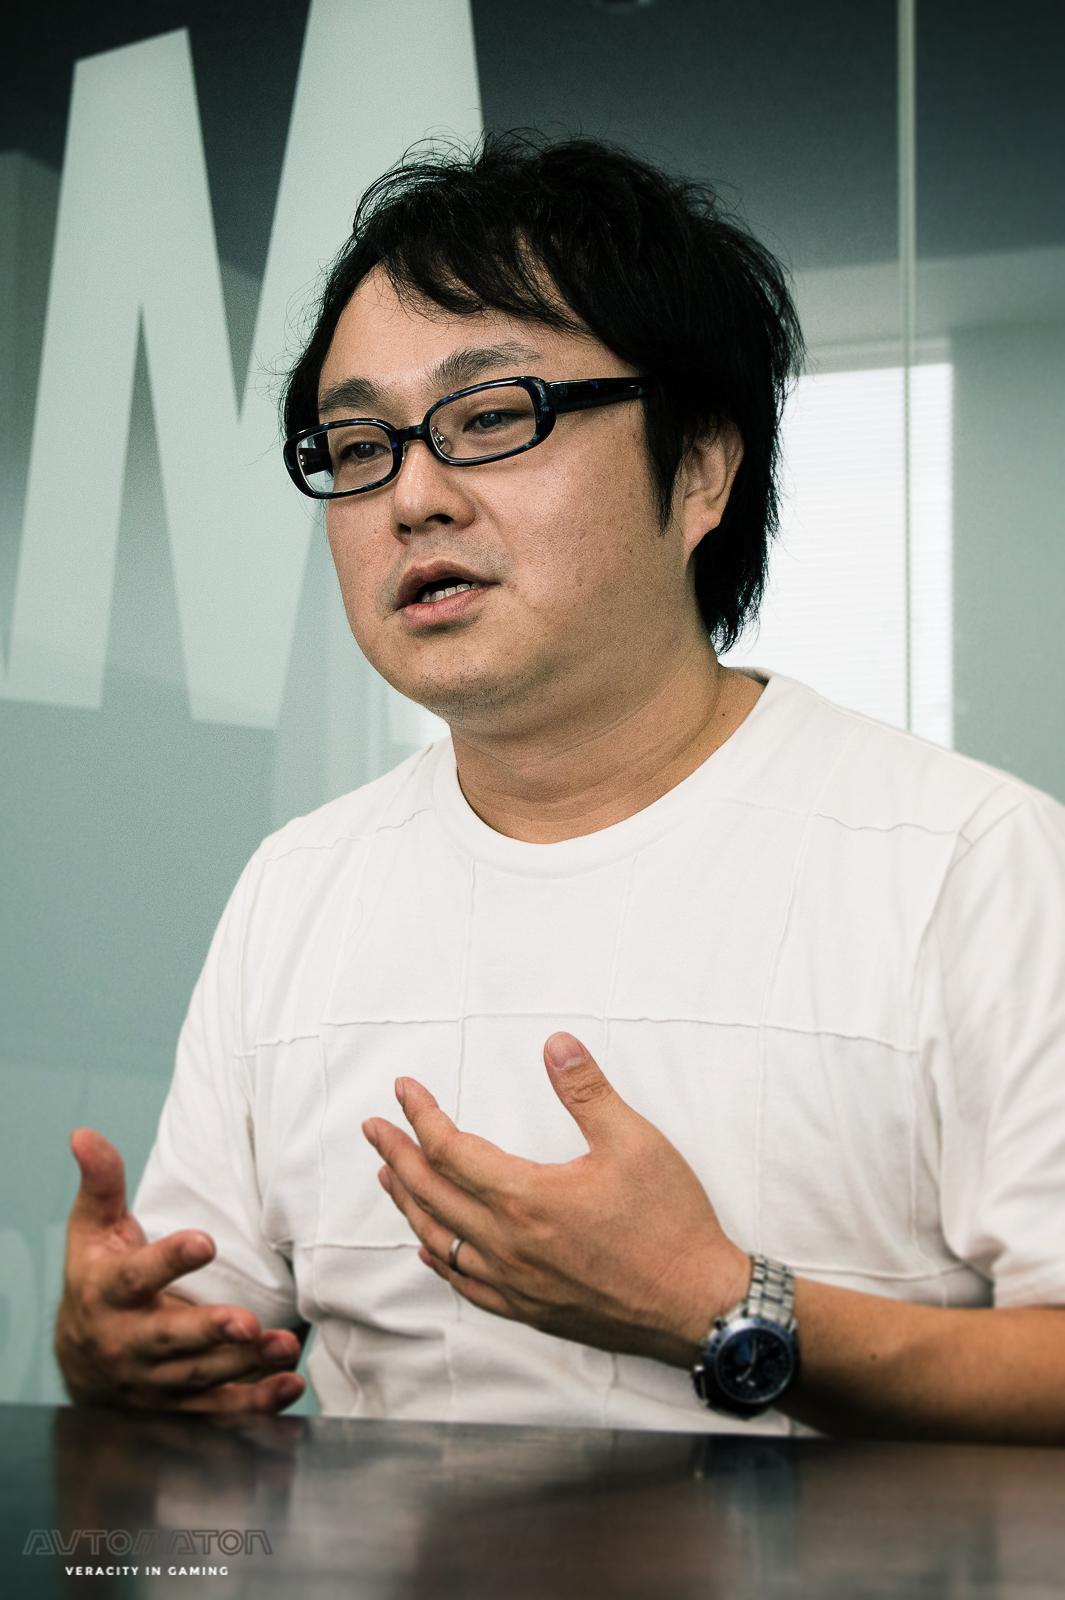 senran-kagura-bakunyu-producer-kenichiro-takaki-interview-001